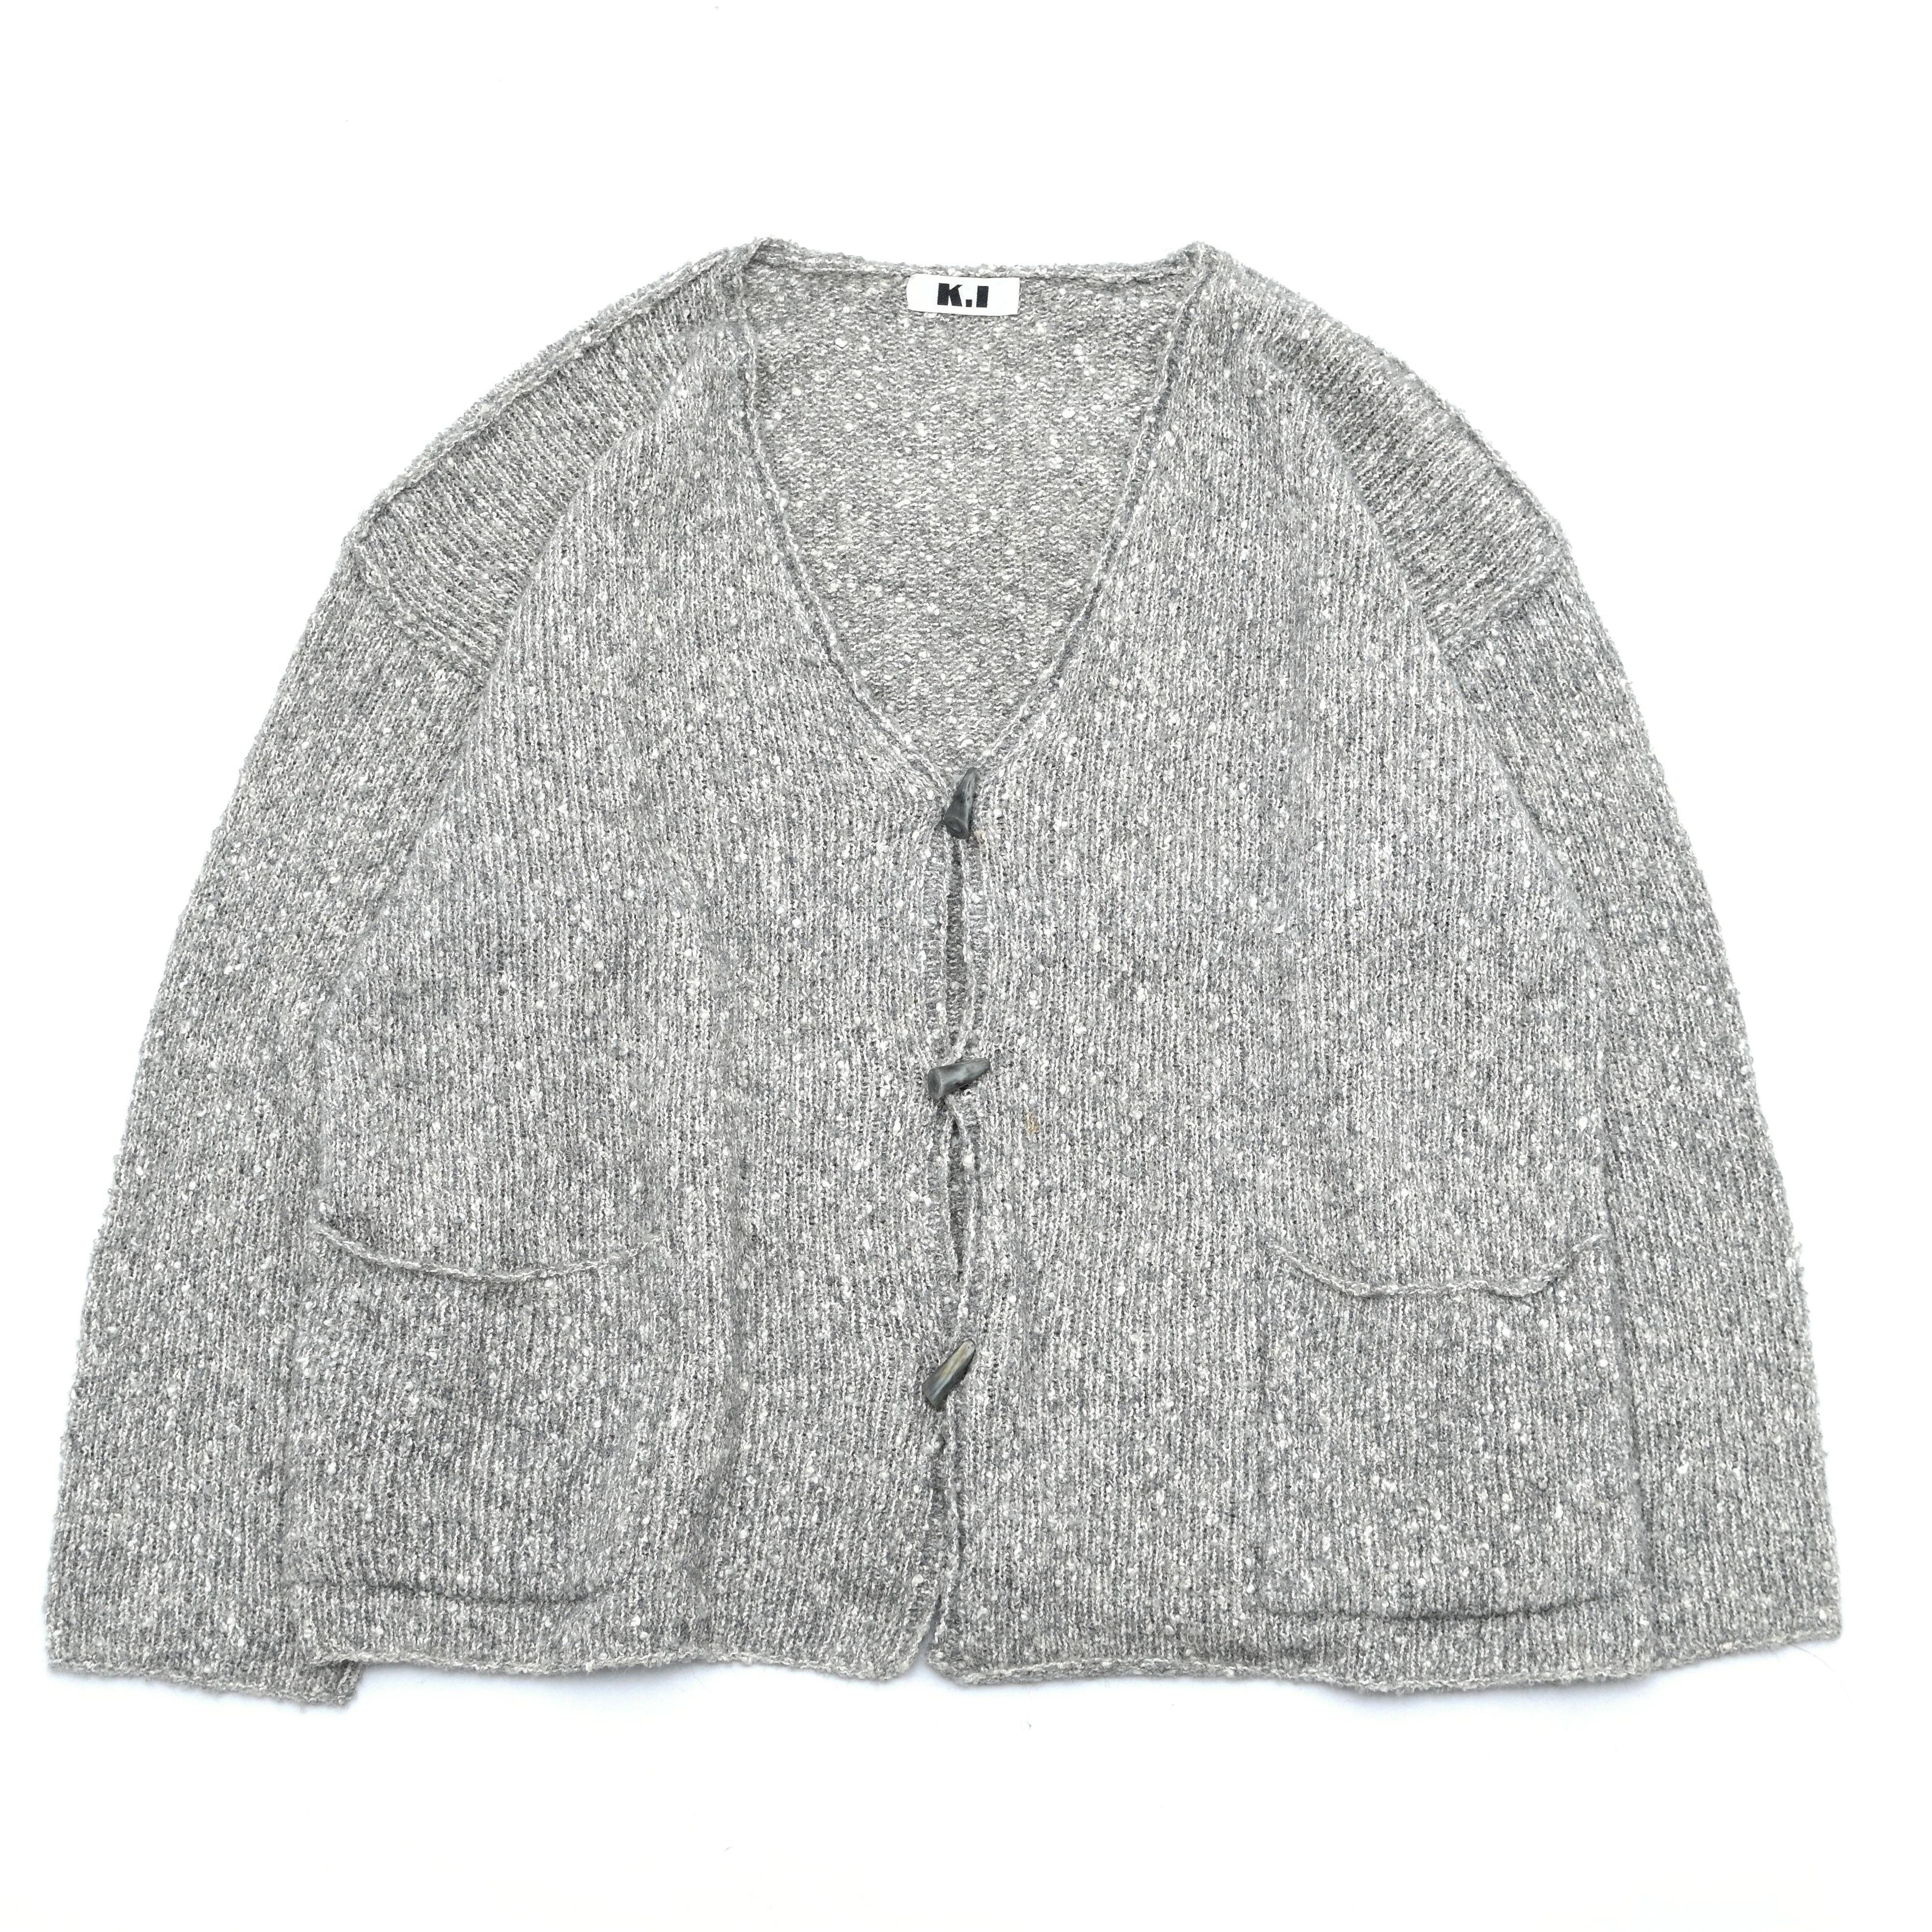 Heather gray rough knitting cardigan